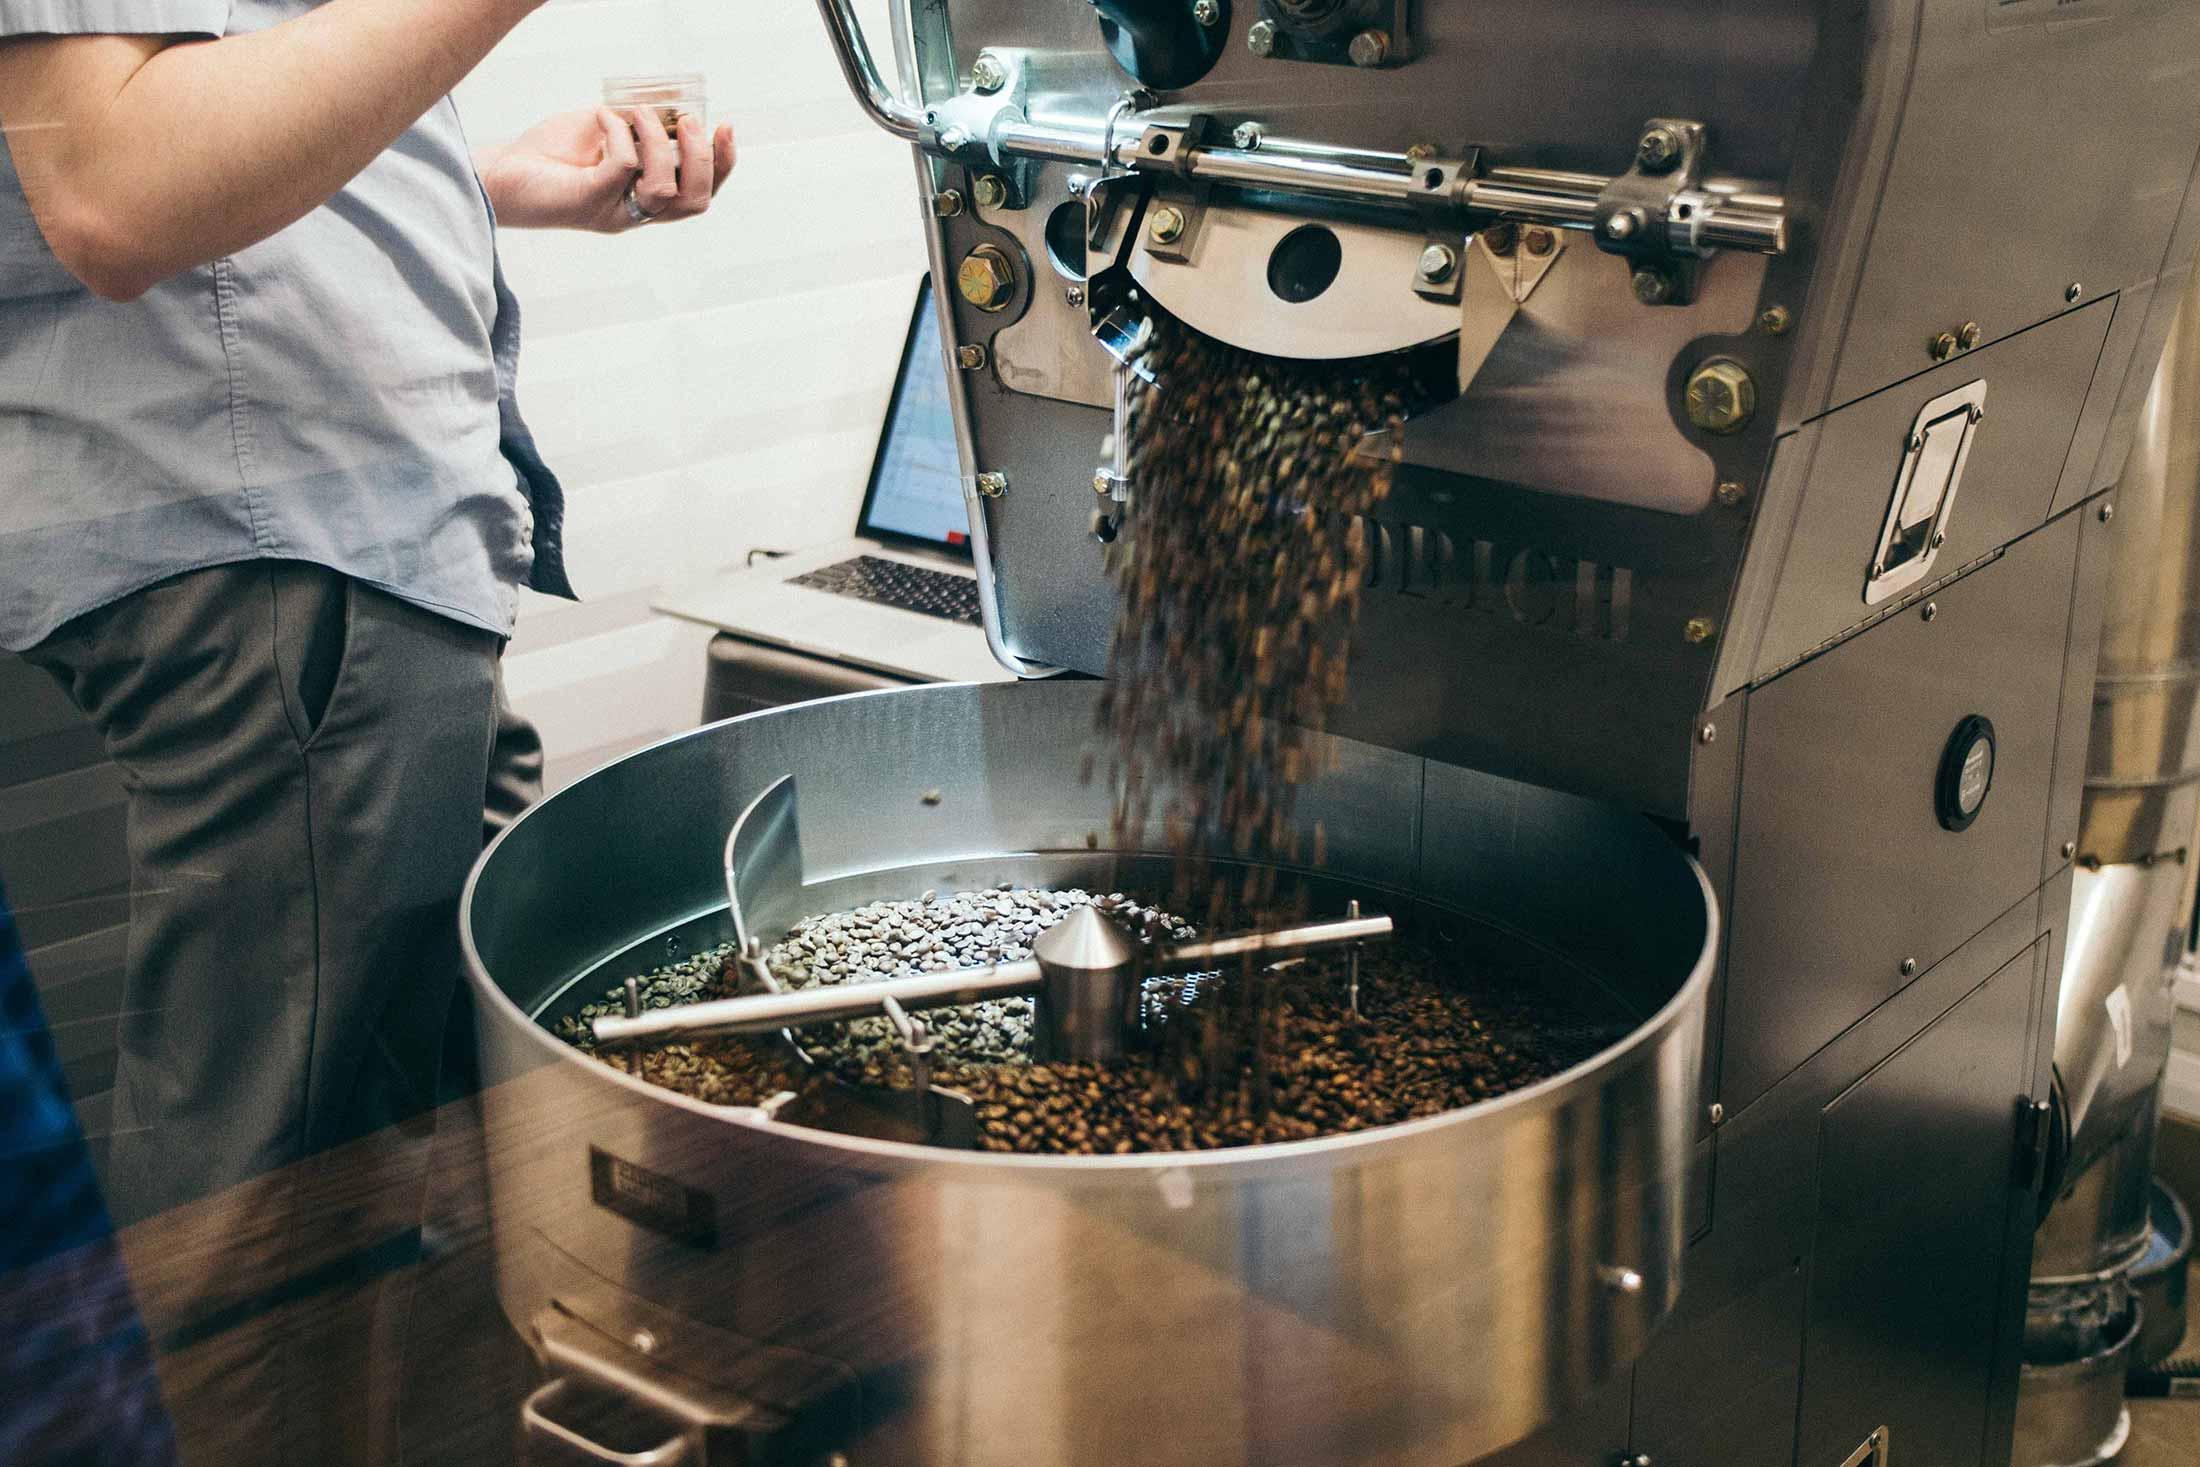 Trommelröstmaschine: Der fertig geröstete Kaffee fällt ins Kühlsieb.